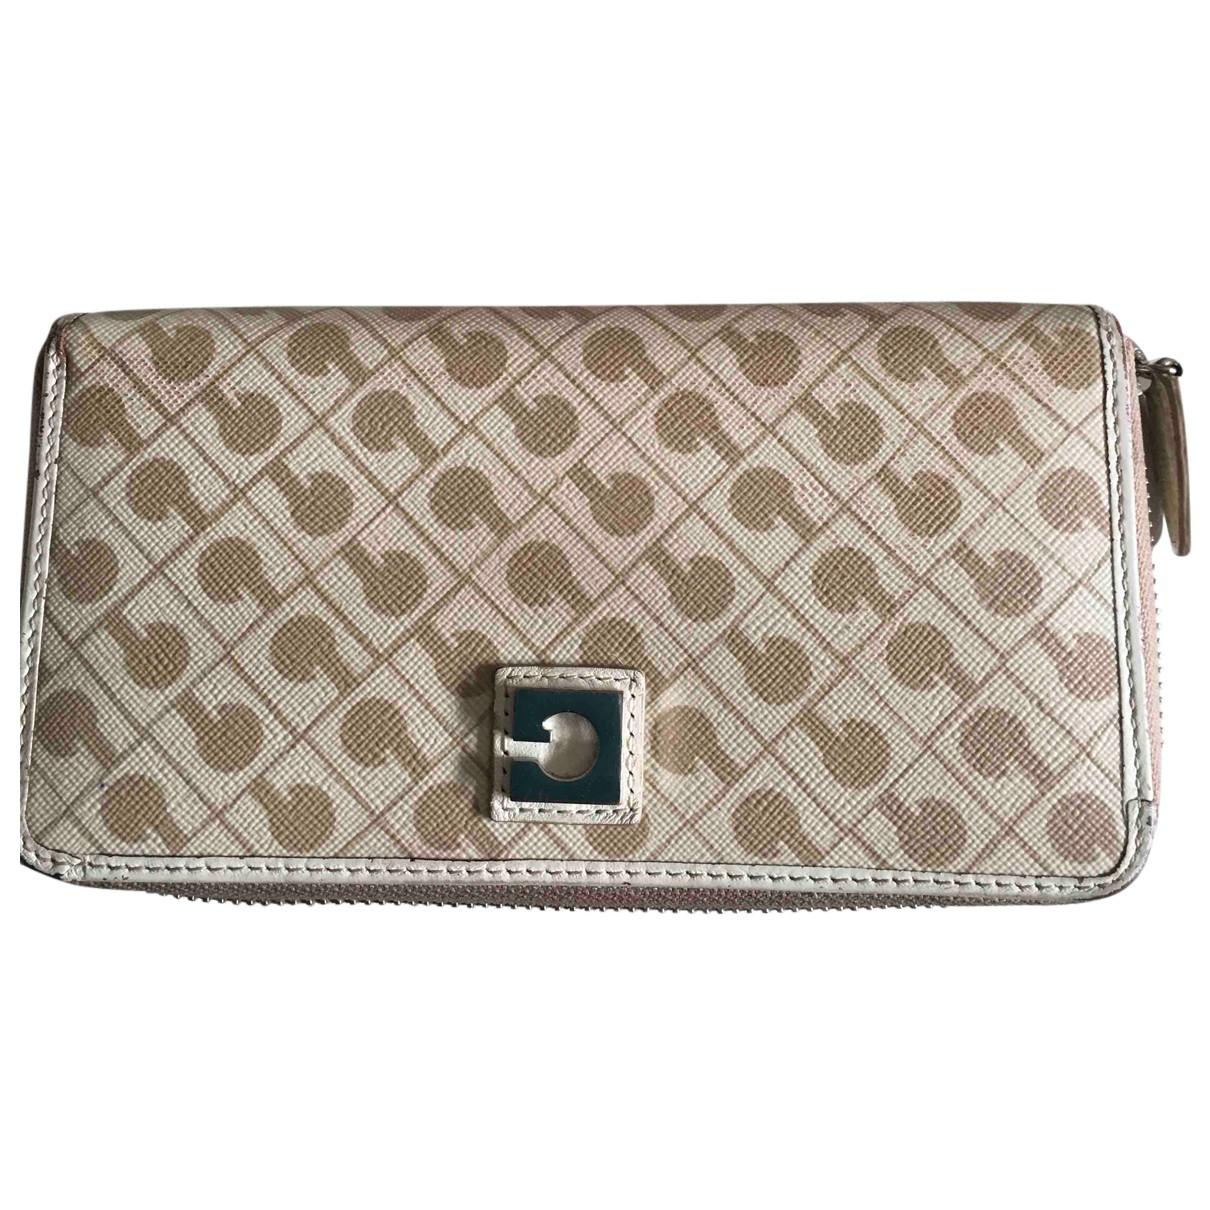 Gherardini N Beige Cloth wallet for Women N